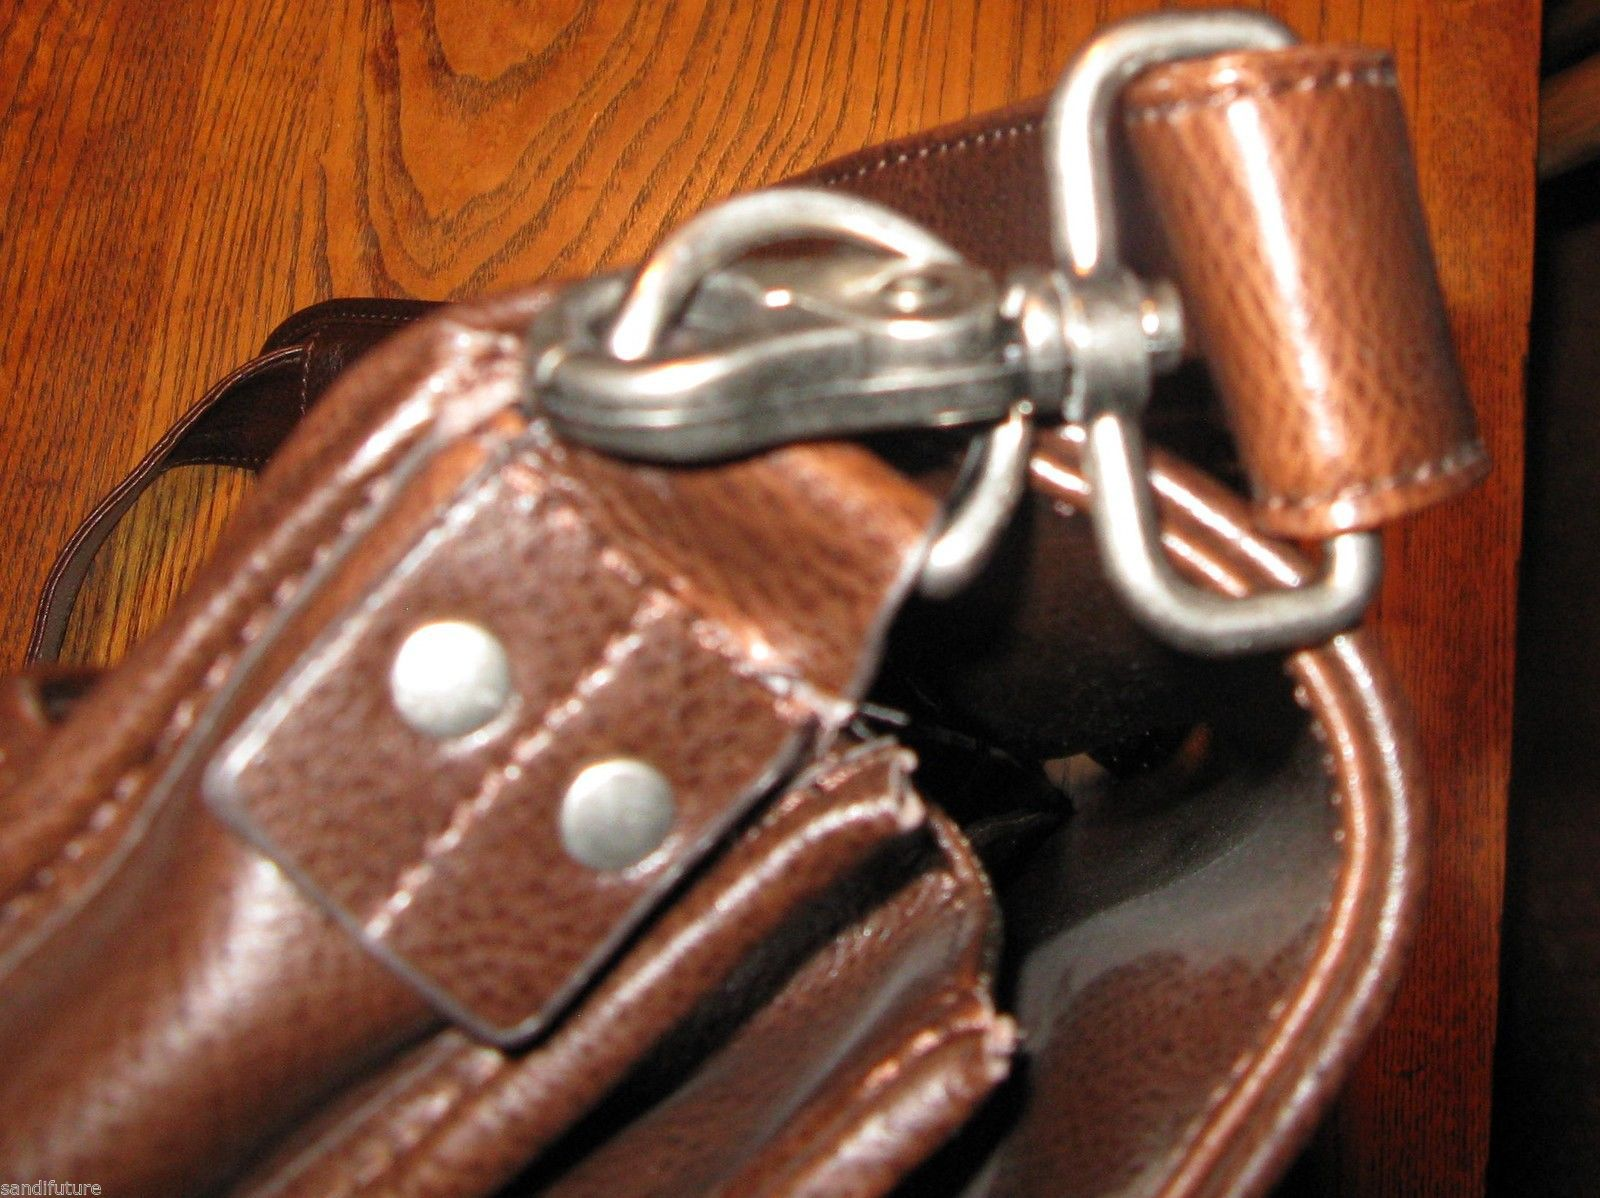 Ellington Portland Belmont classic travel vintage brown leather briefcase as-is image 4